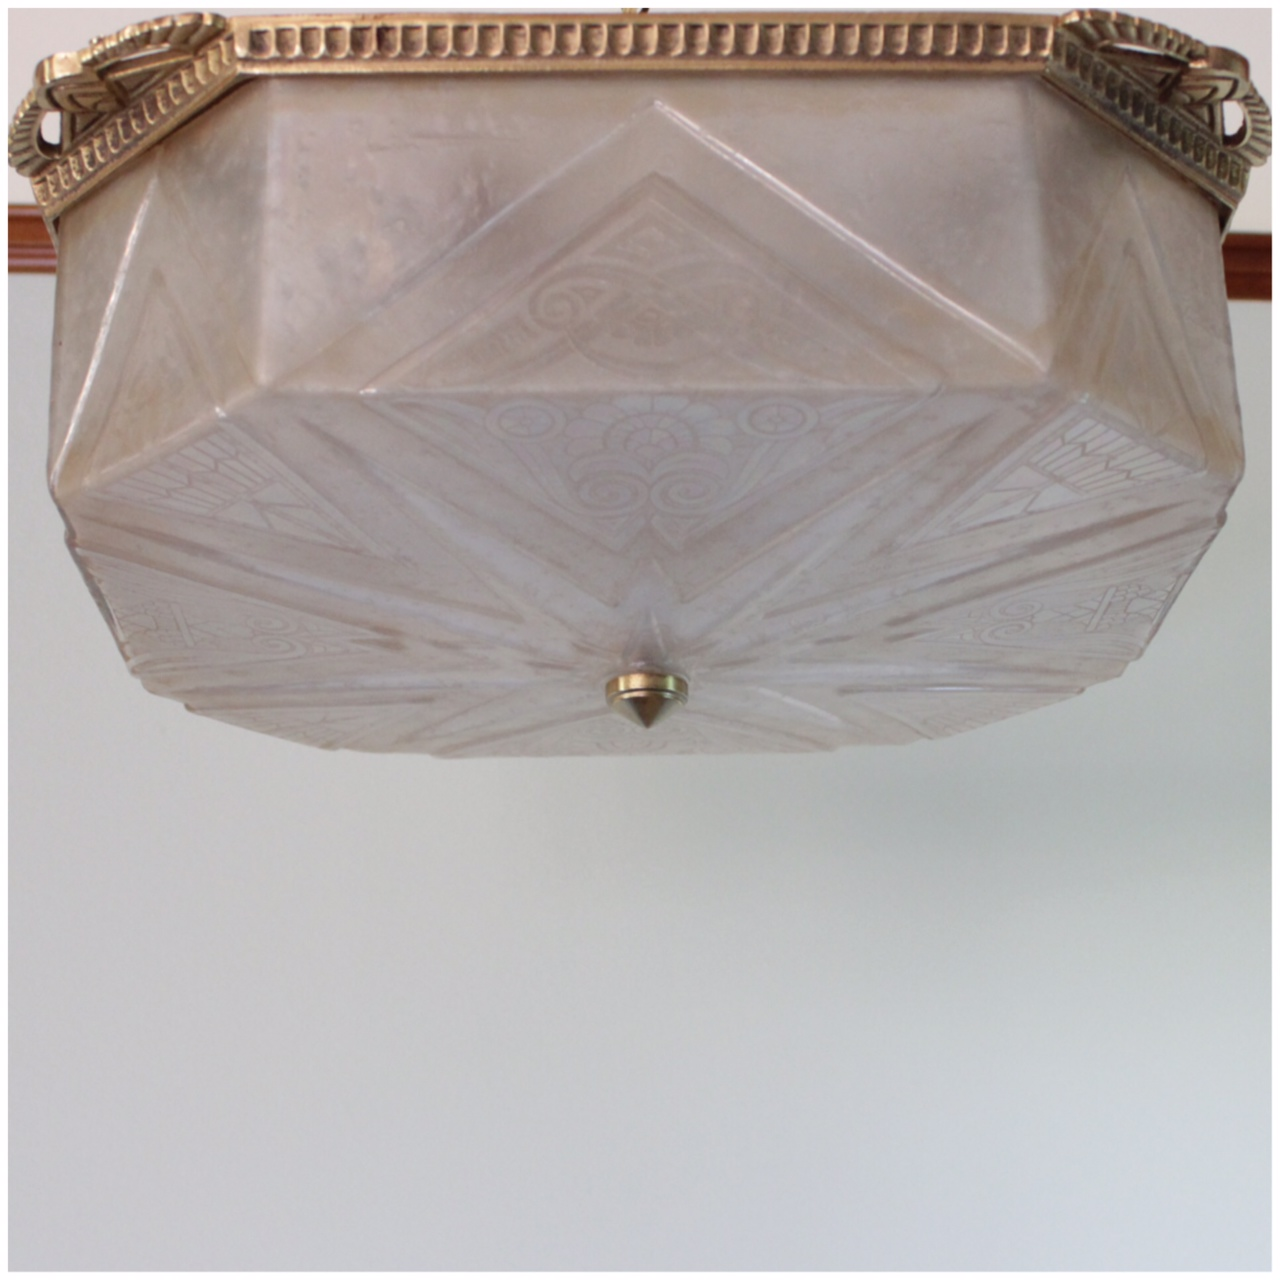 #A4640 Art Deco Flush Mount Light | Bogart, Bremmer u0026 Bradley Antiques